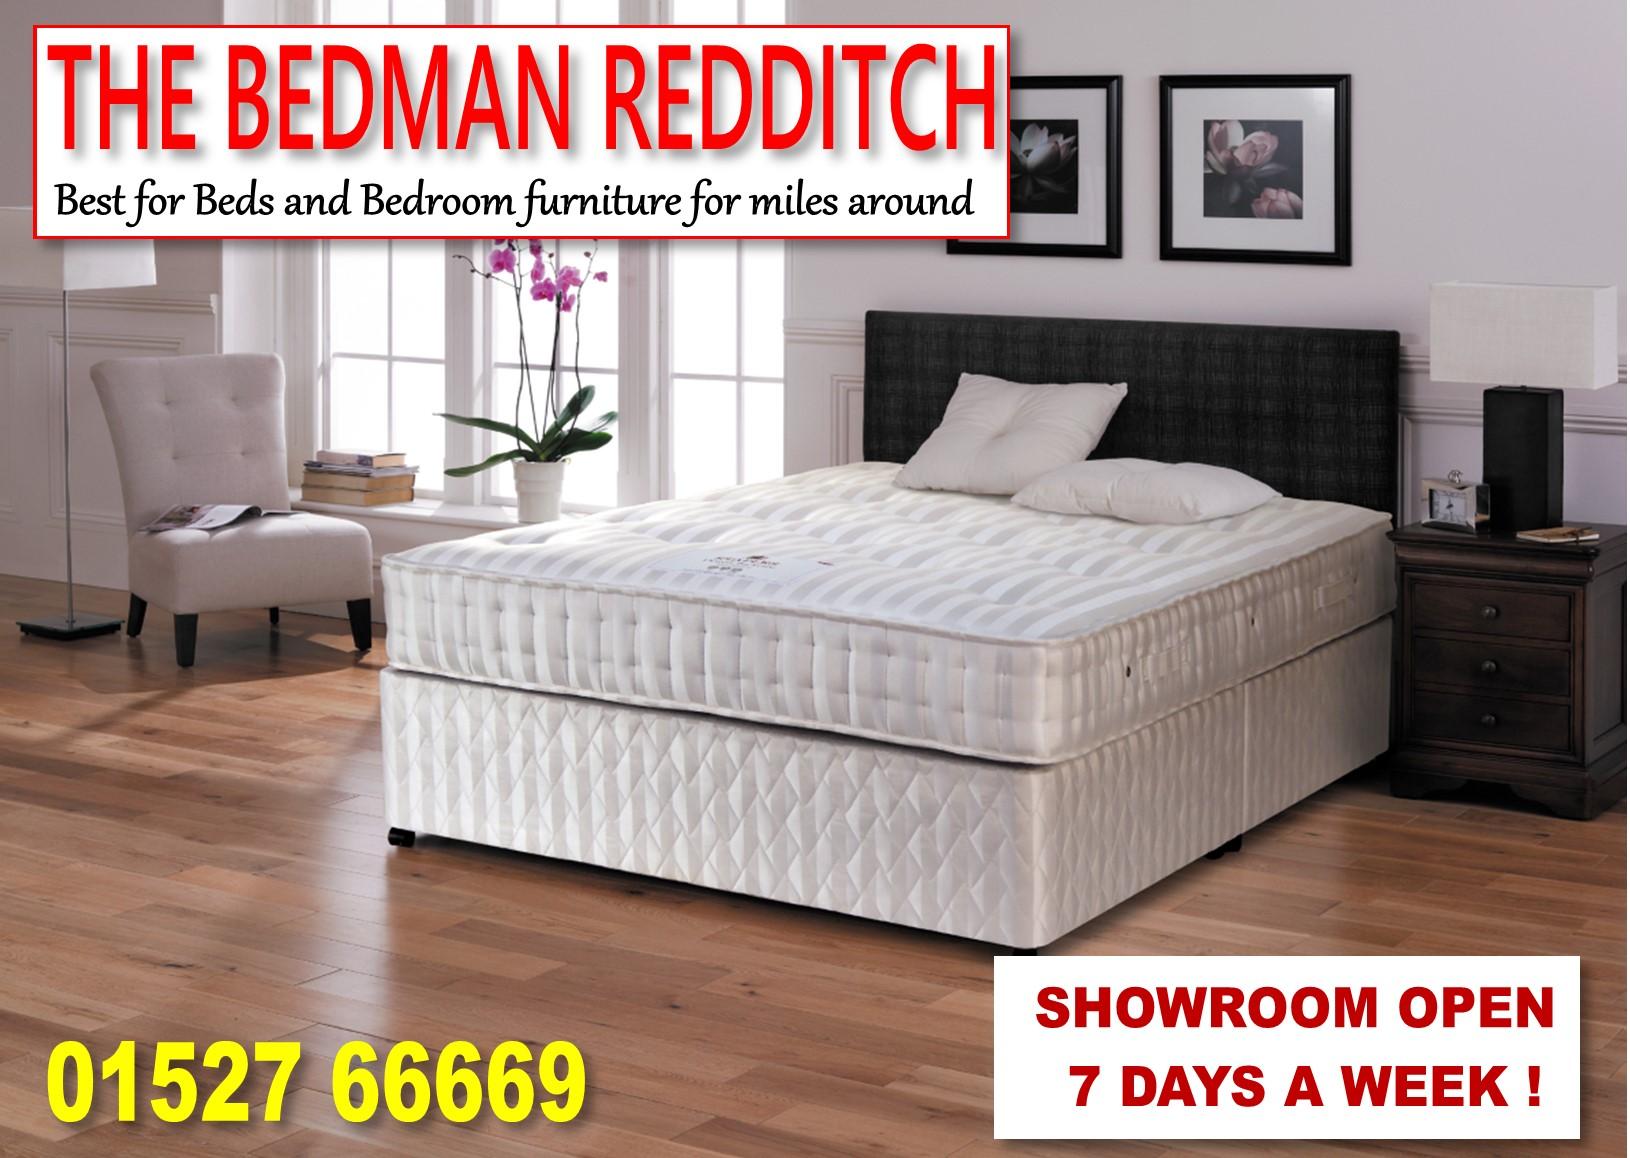 The bedman redditch